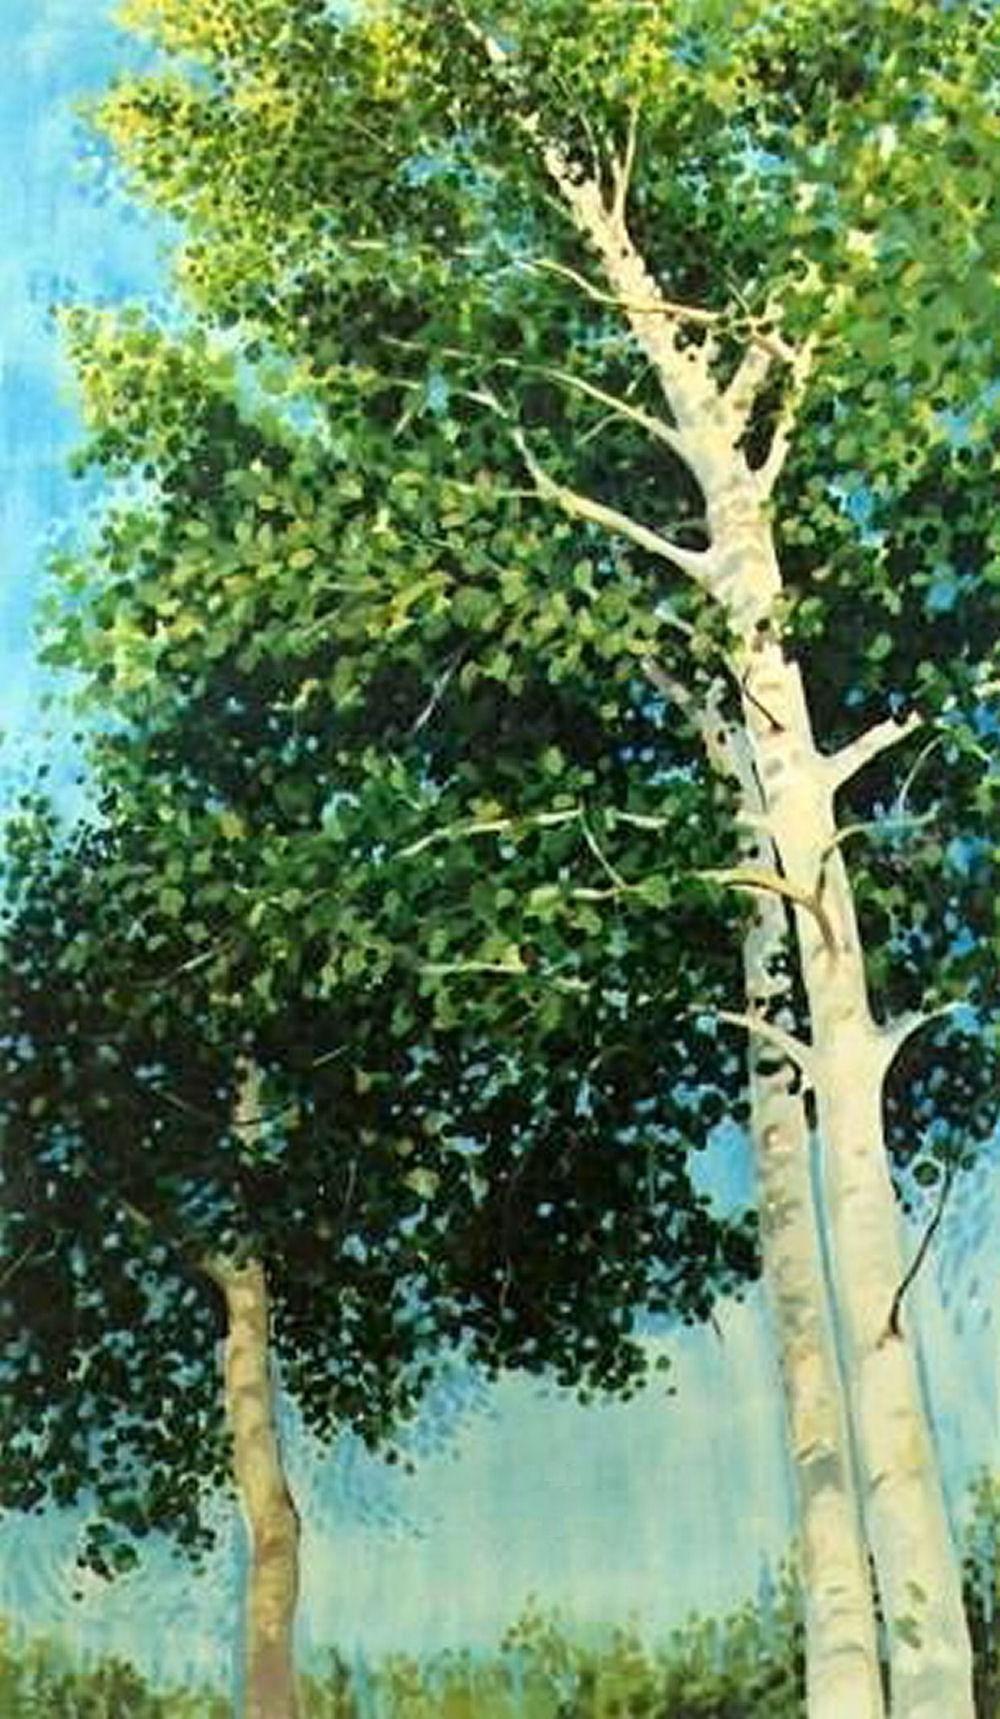 Aspen, Maine, USA, 50H x 28W inches acrylics on canvas, narrow frame. Older work, 1996